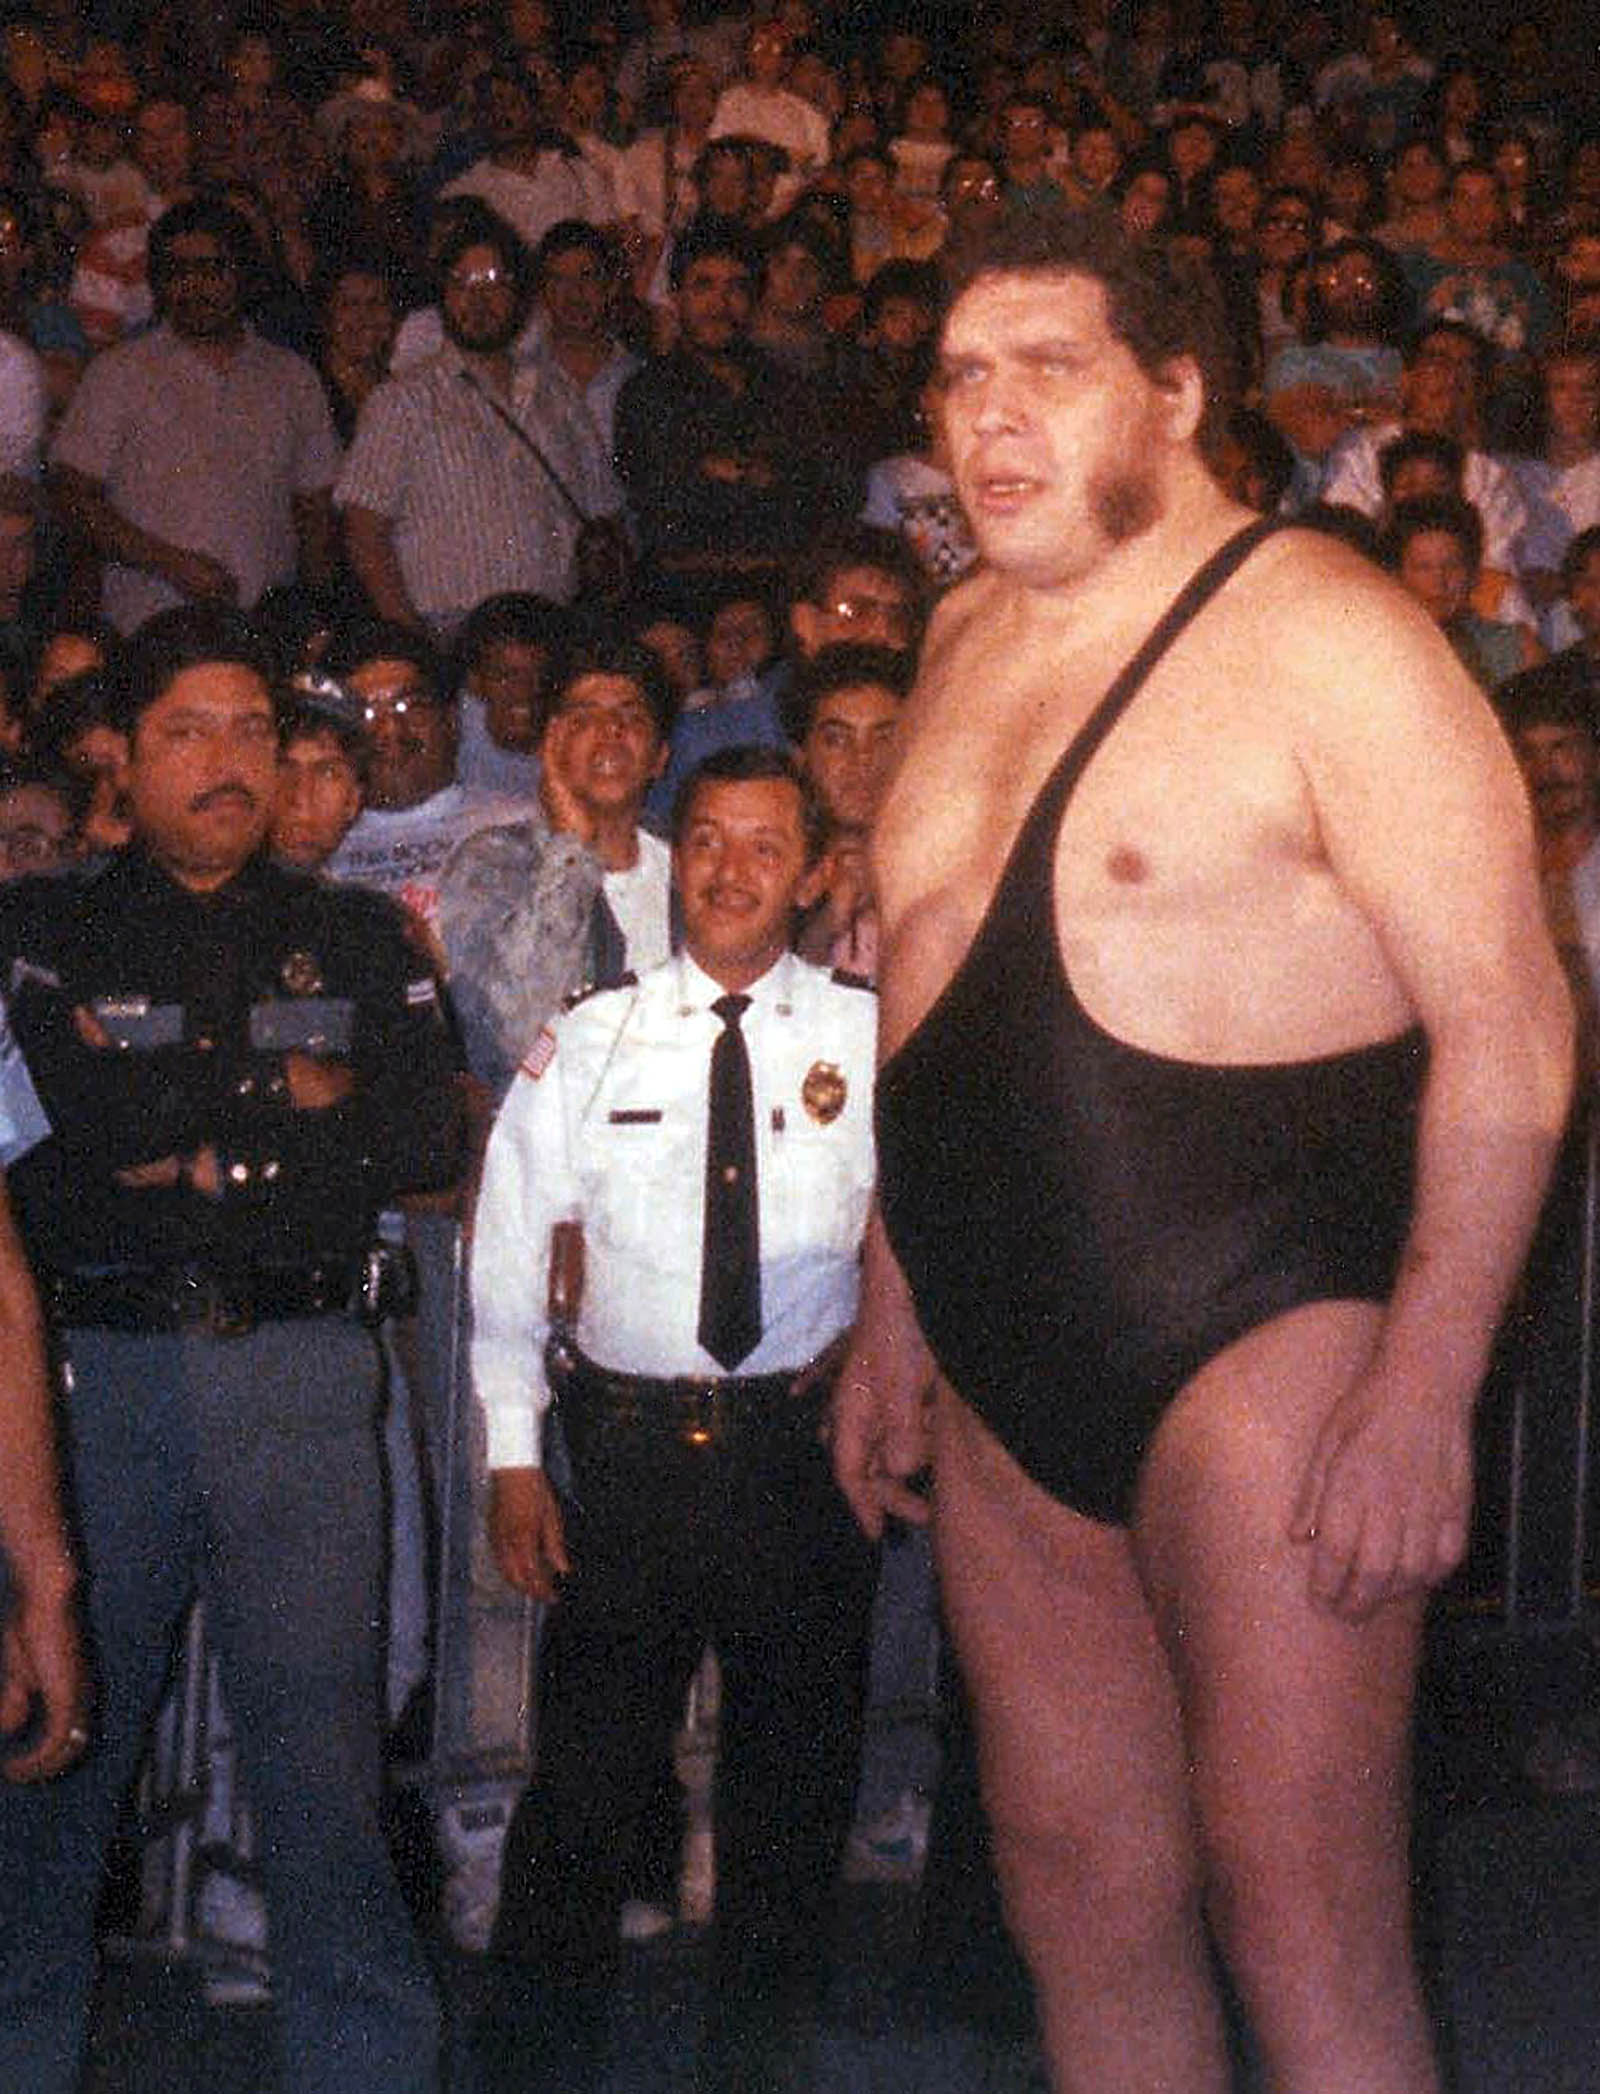 André the Giant's Wrestling Singlet